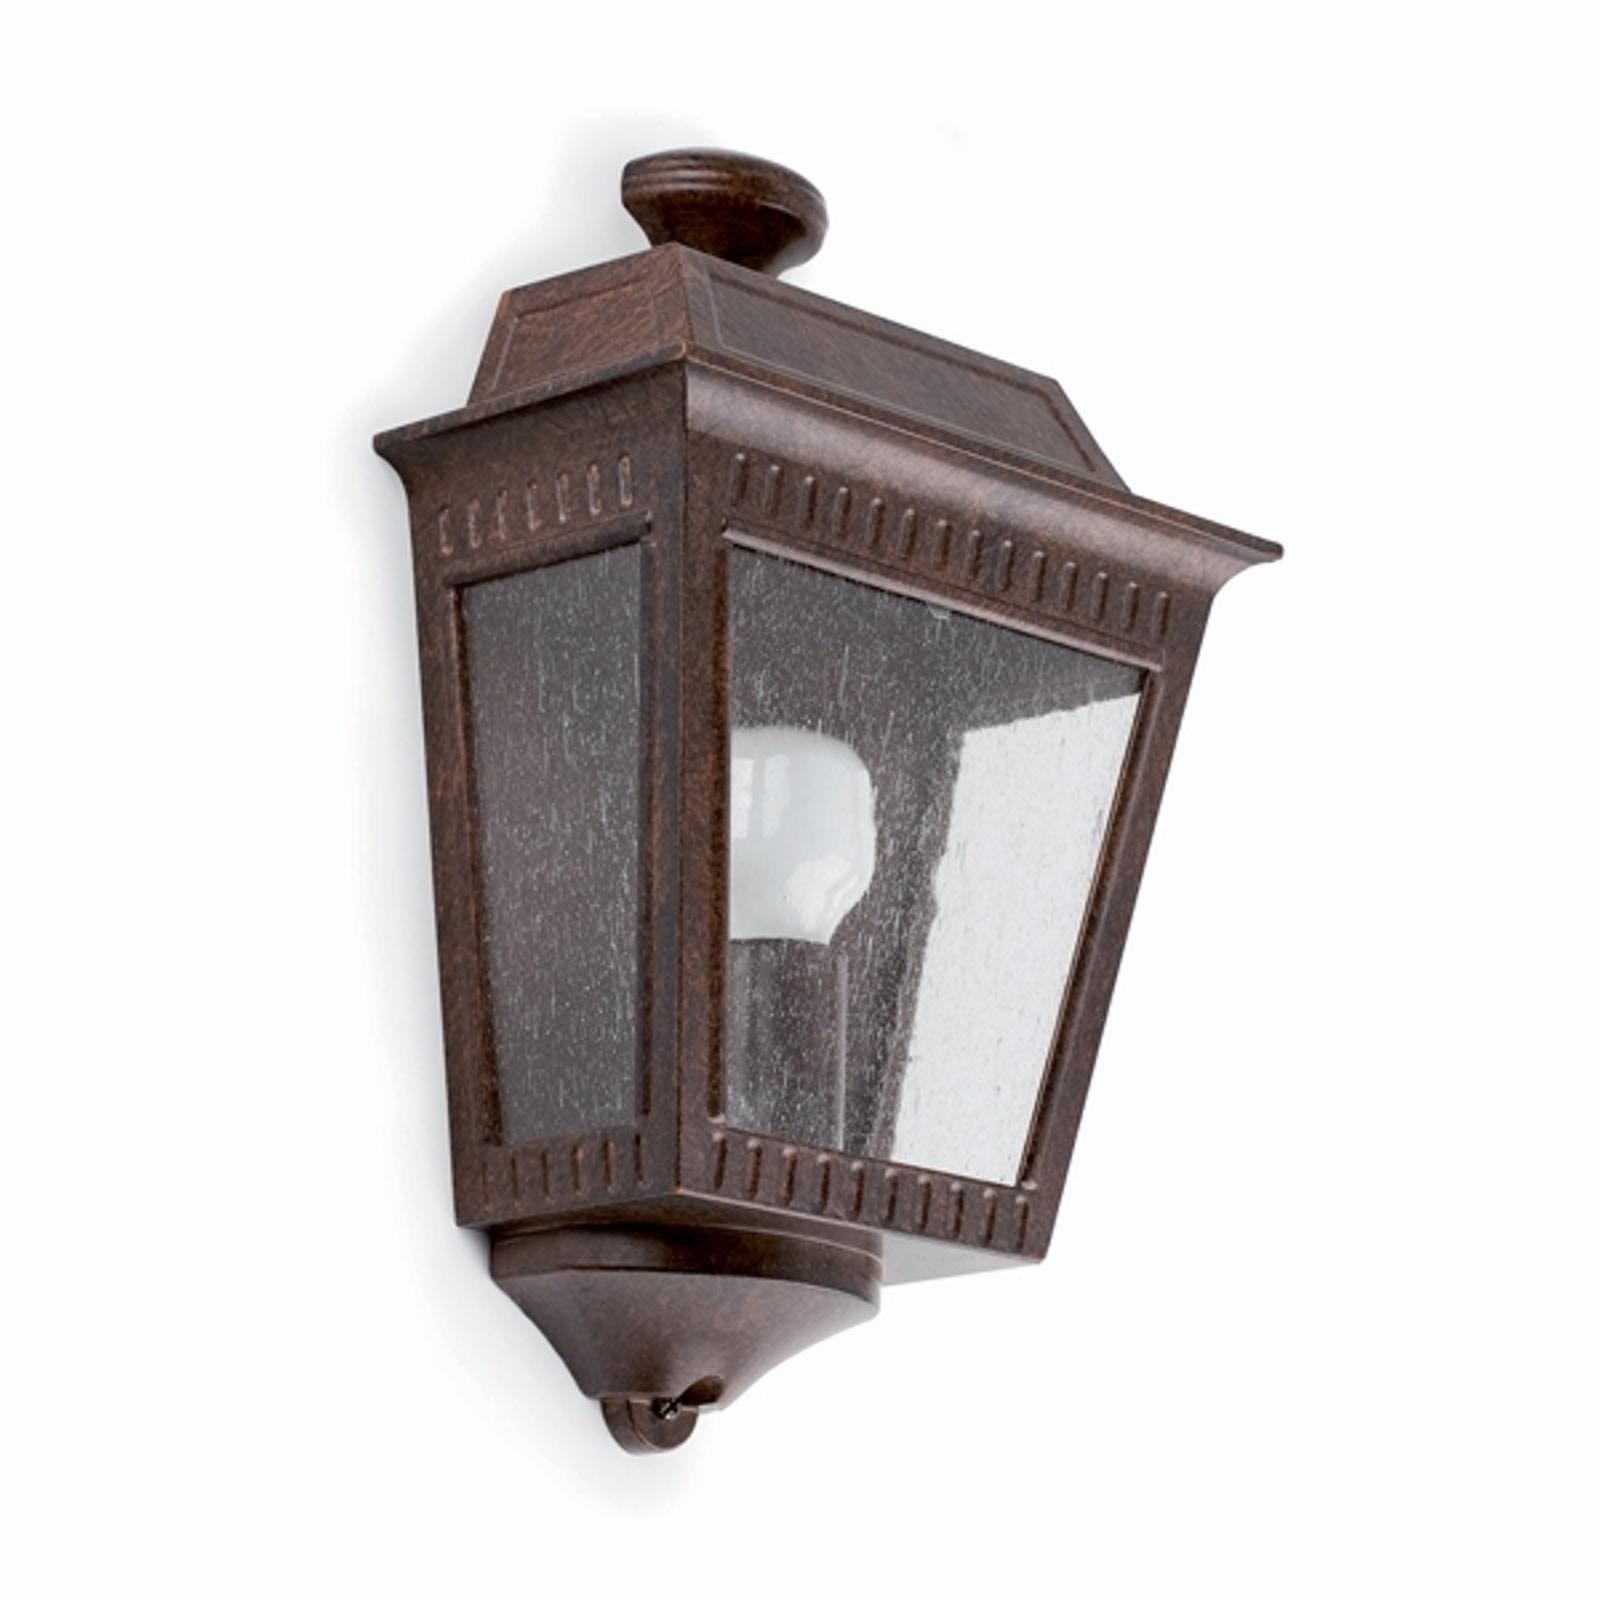 Rustic Argot Exterior Wall Lamp_3505130_1